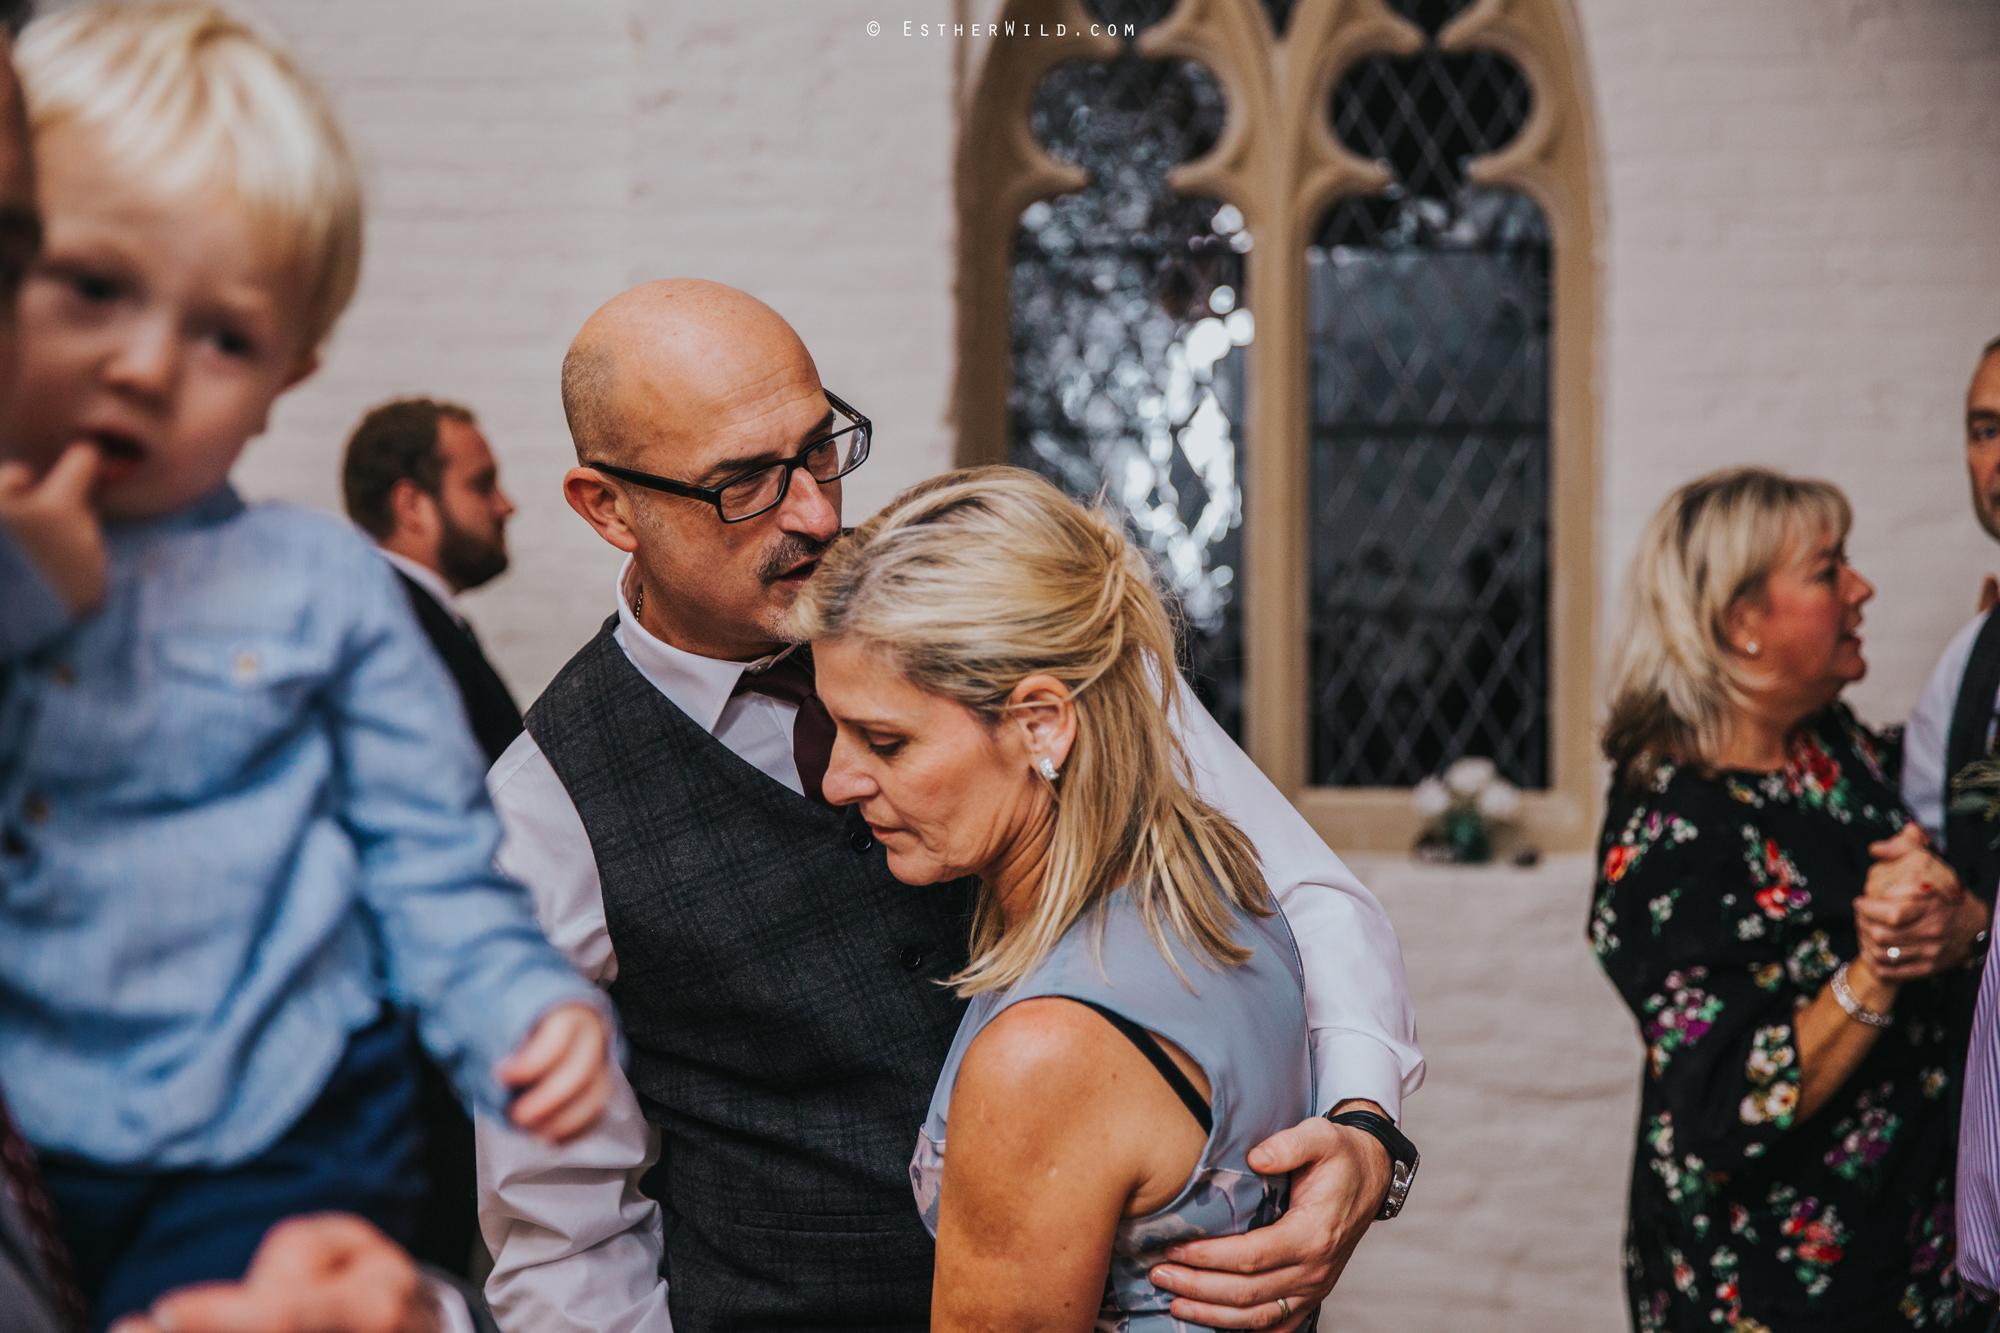 Reading_Room_Weddings_Alby_Norwich_Photographer_Esther_Wild_IMG_4055.jpg